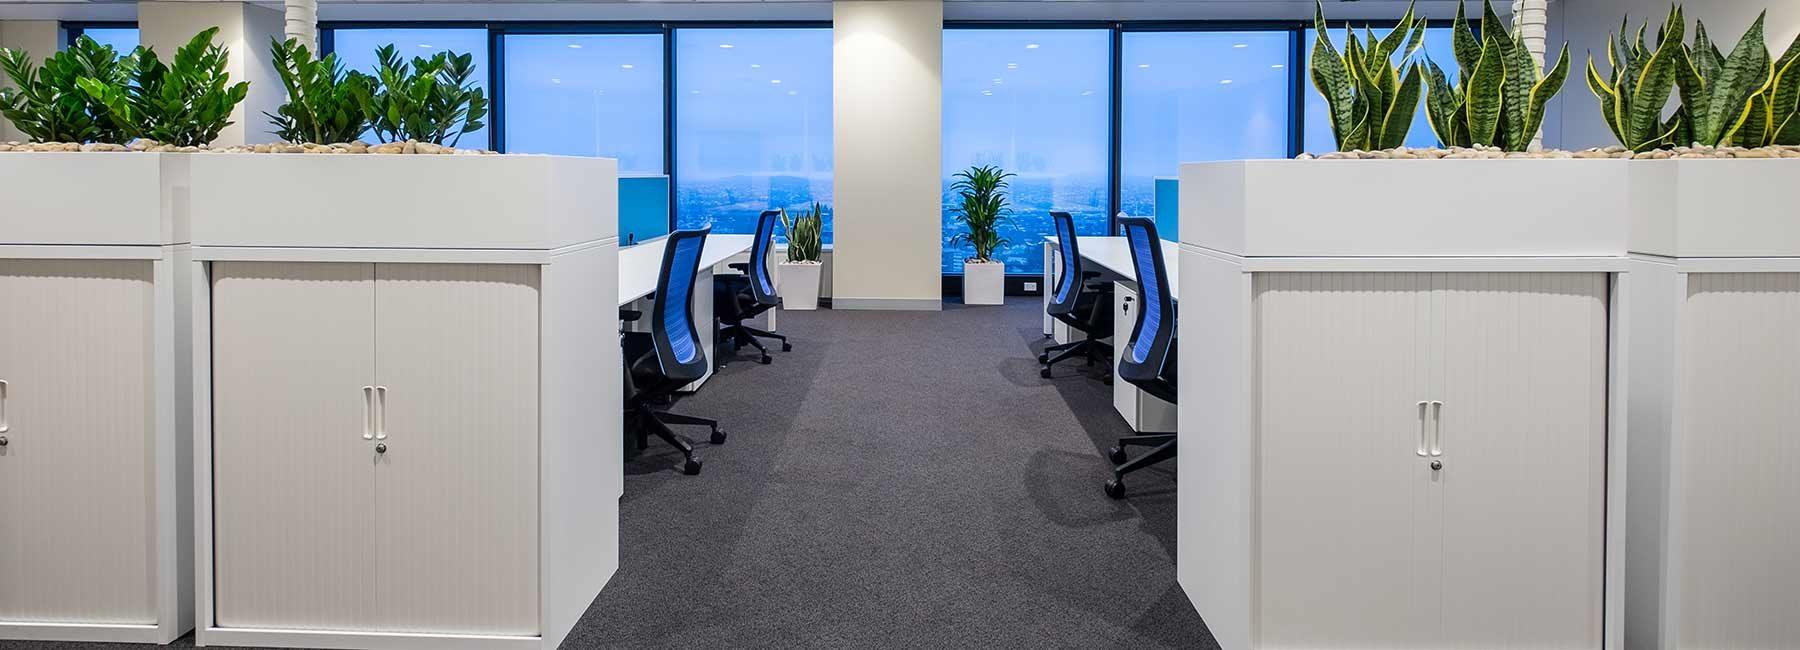 BankofCommunicationsBrisbane-australia-commercial-fitout-3-1800x650.jpg